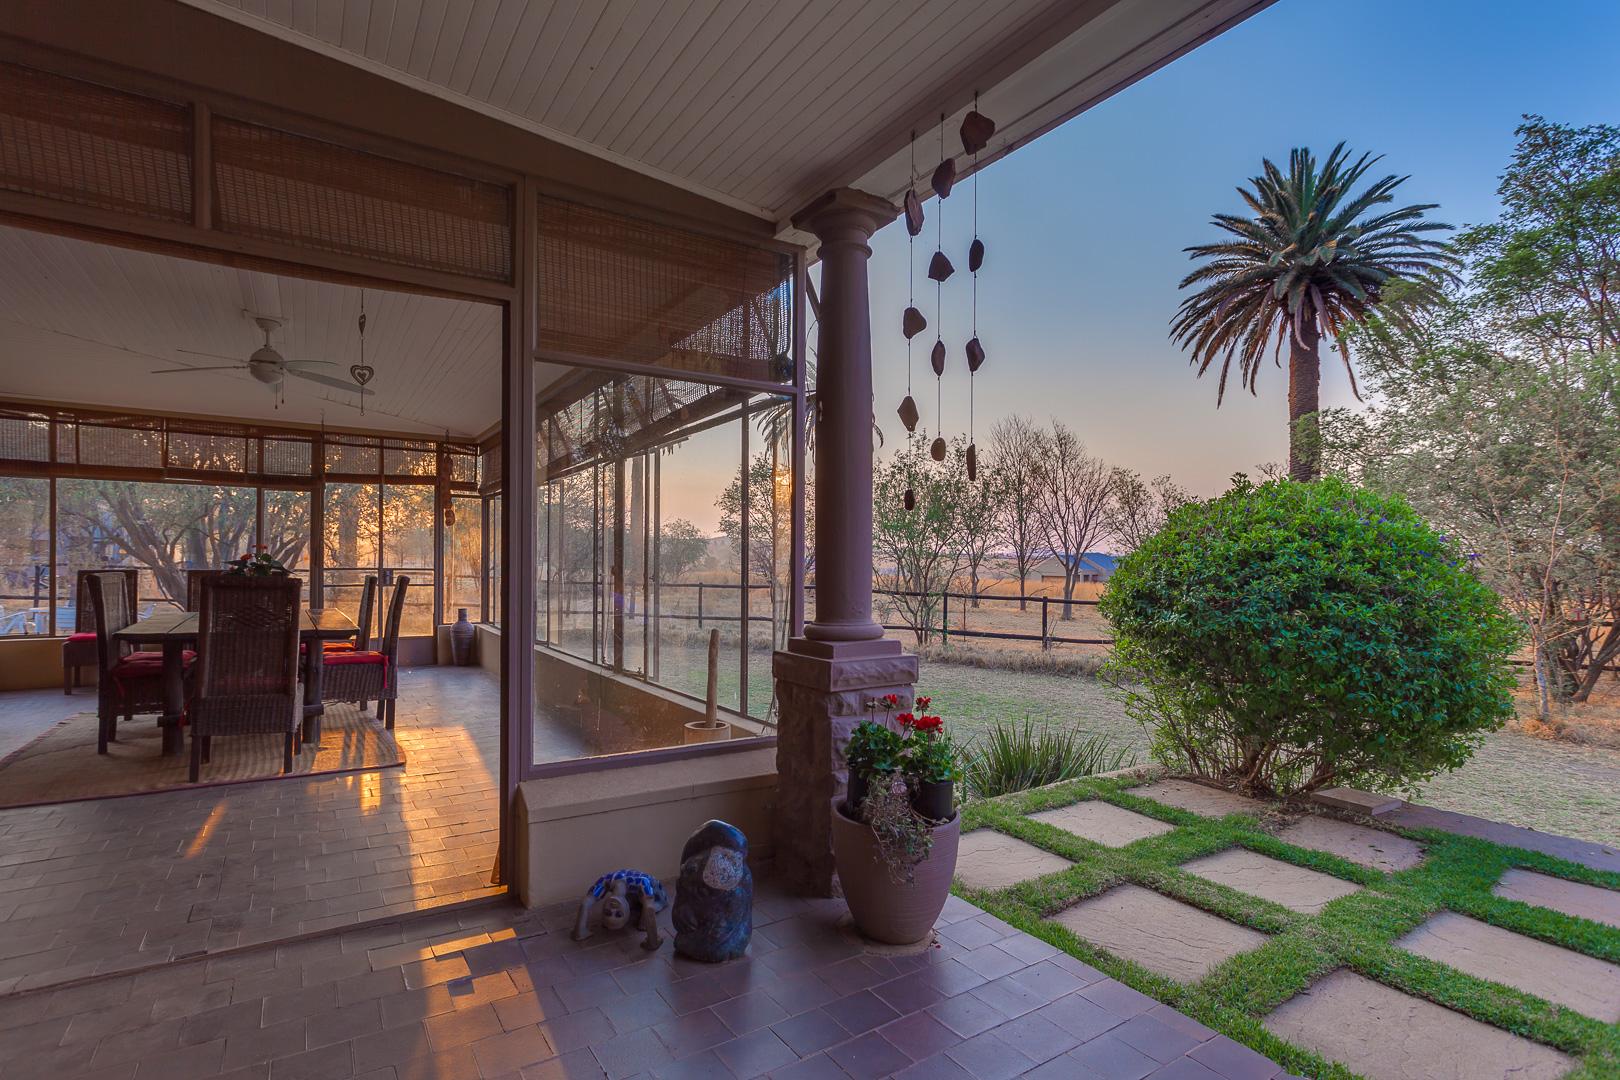 3 BedroomHouse For Sale In Kromdraai